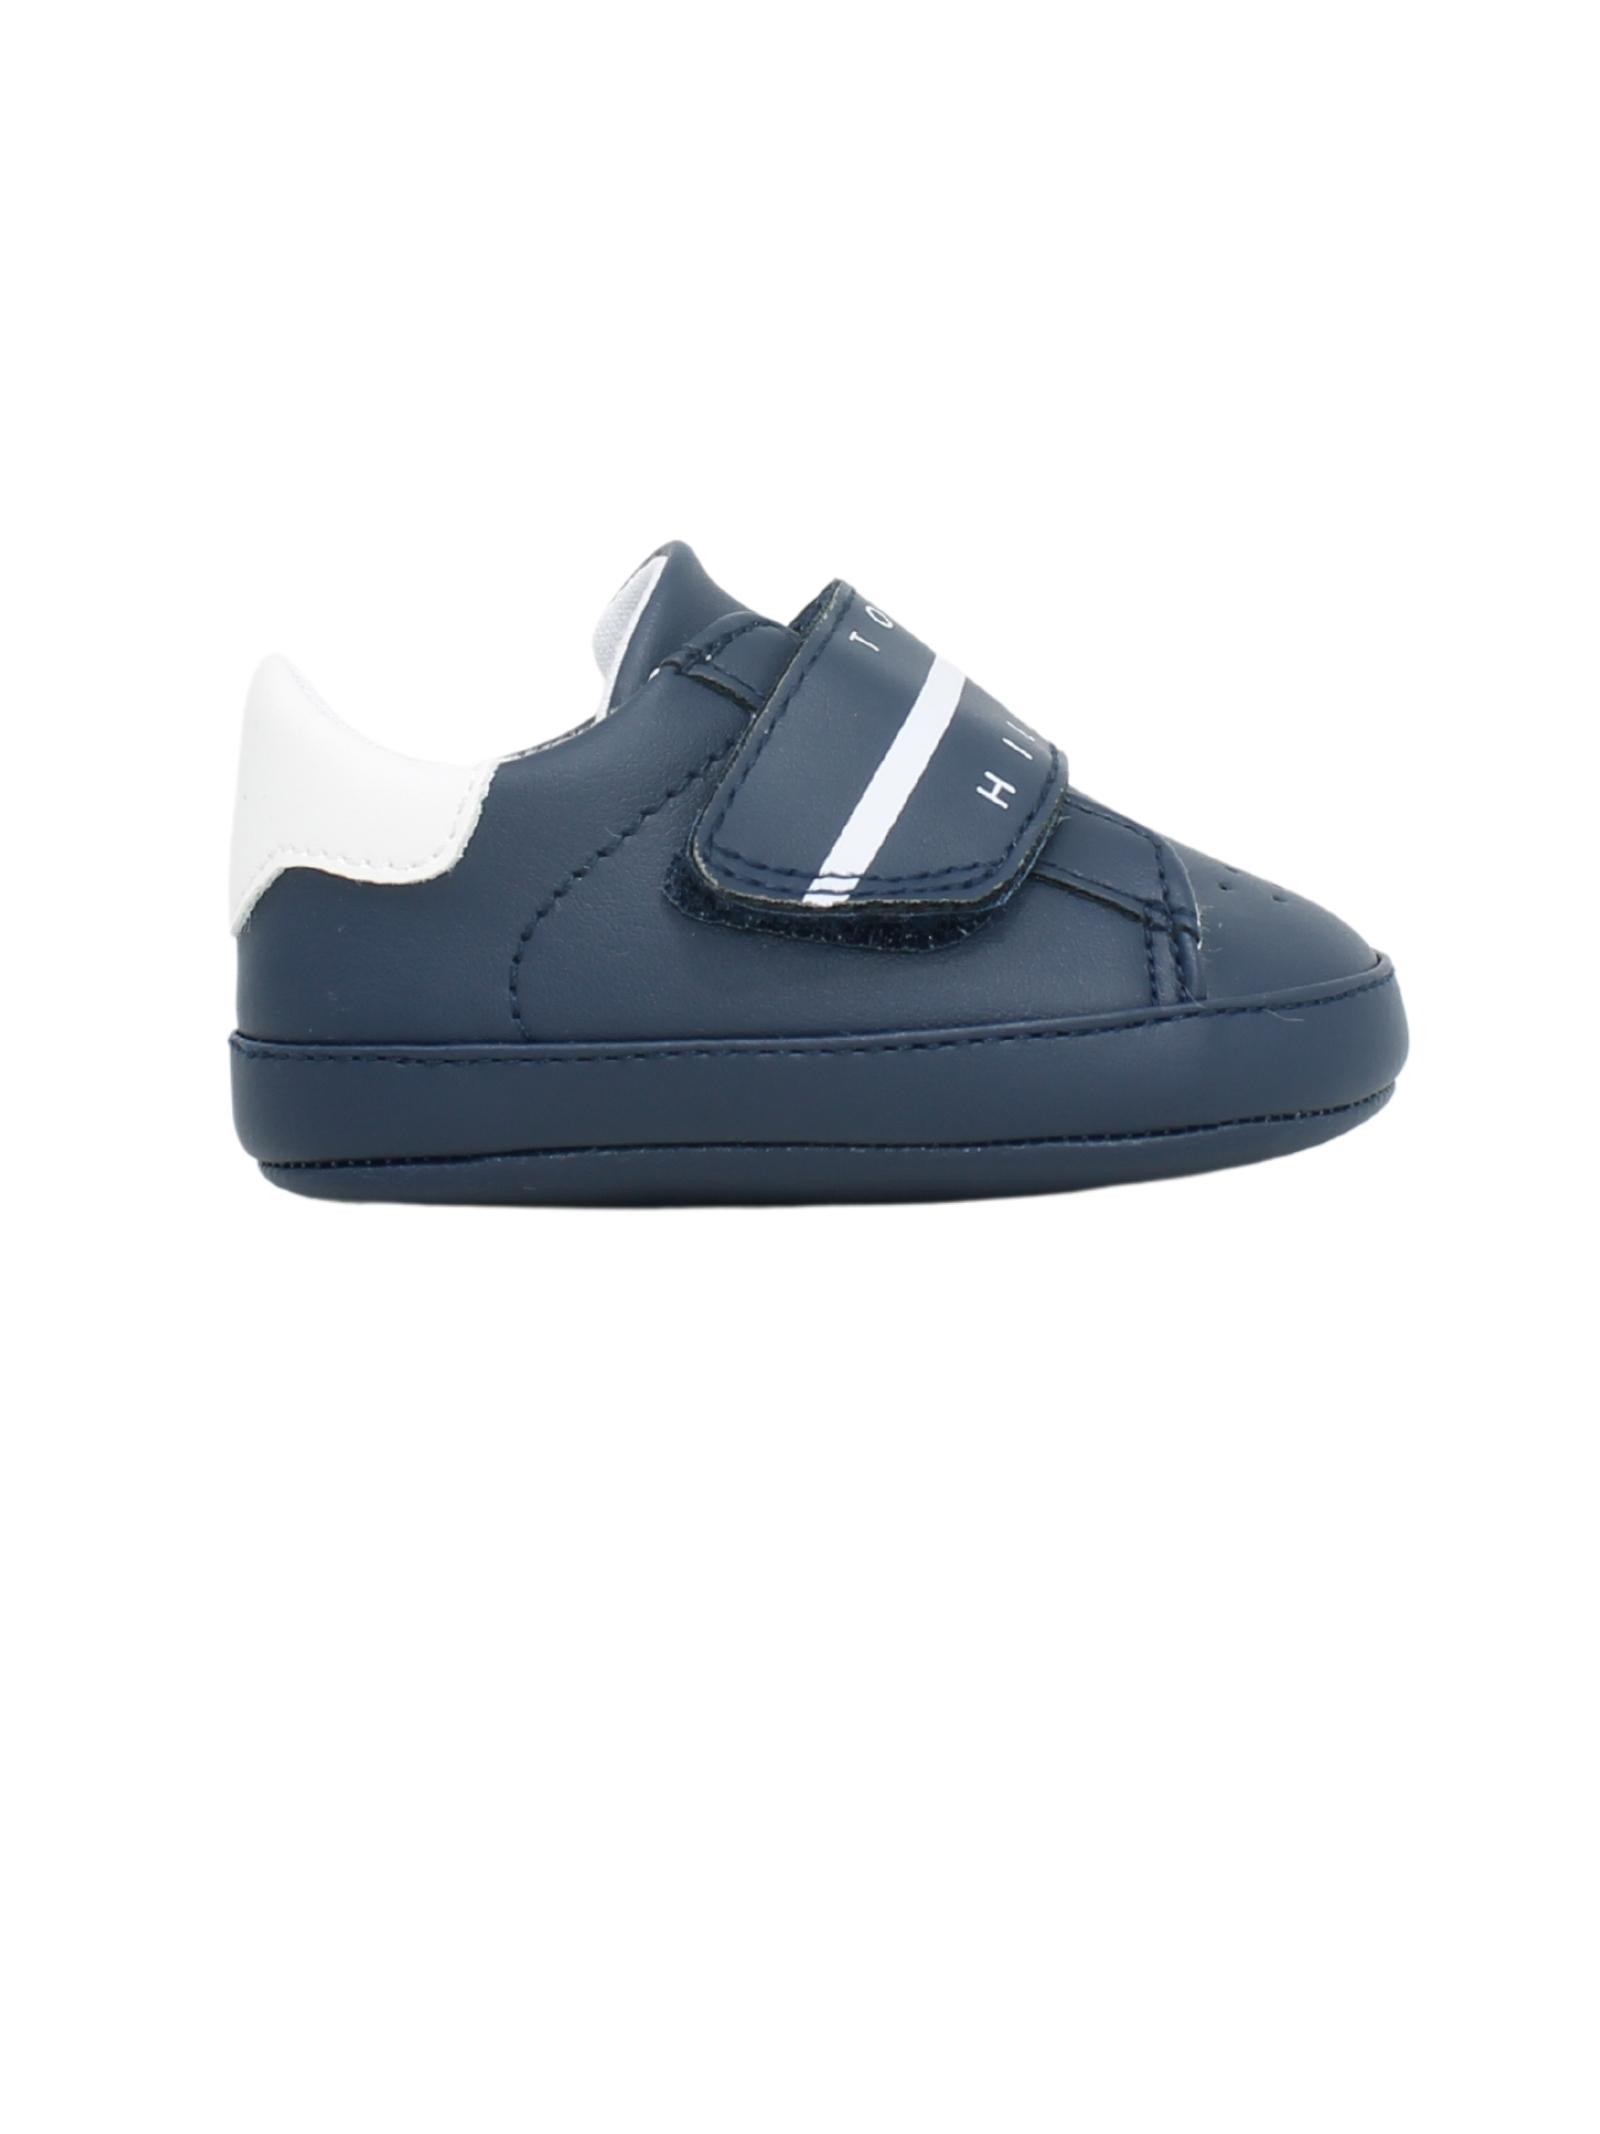 Newborn Imitation Leather Shoes TOMMY HILFIGER KIDS | Shoes | T0B4320360272800BLU